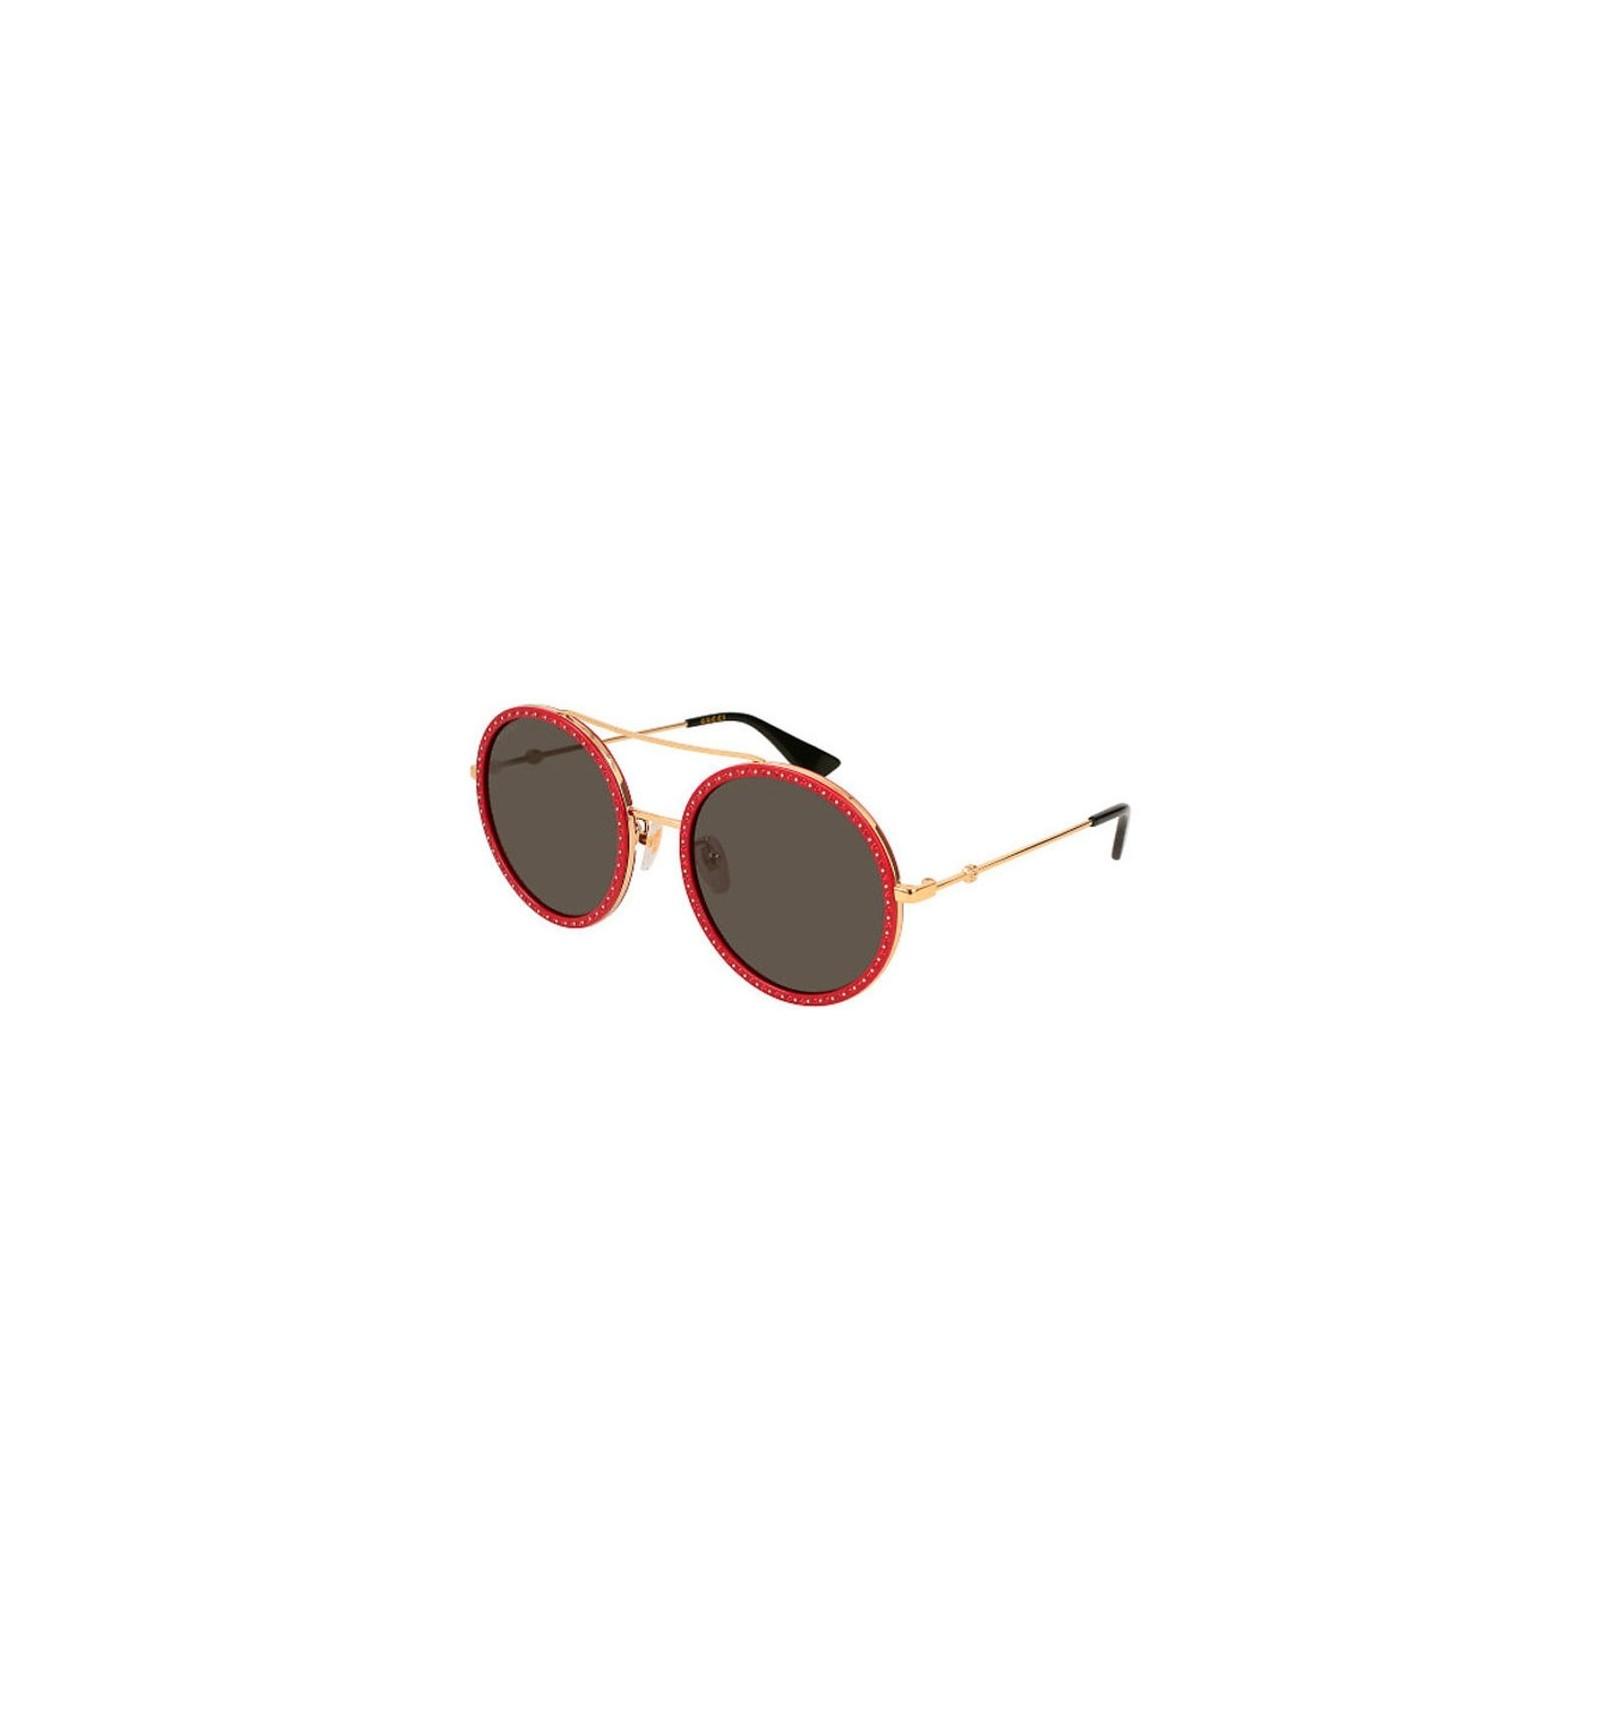 da8da4b4a6 Gafas de Sol GUCCI GG0061S Gold Red Stones - Grey. Envío Gratuito